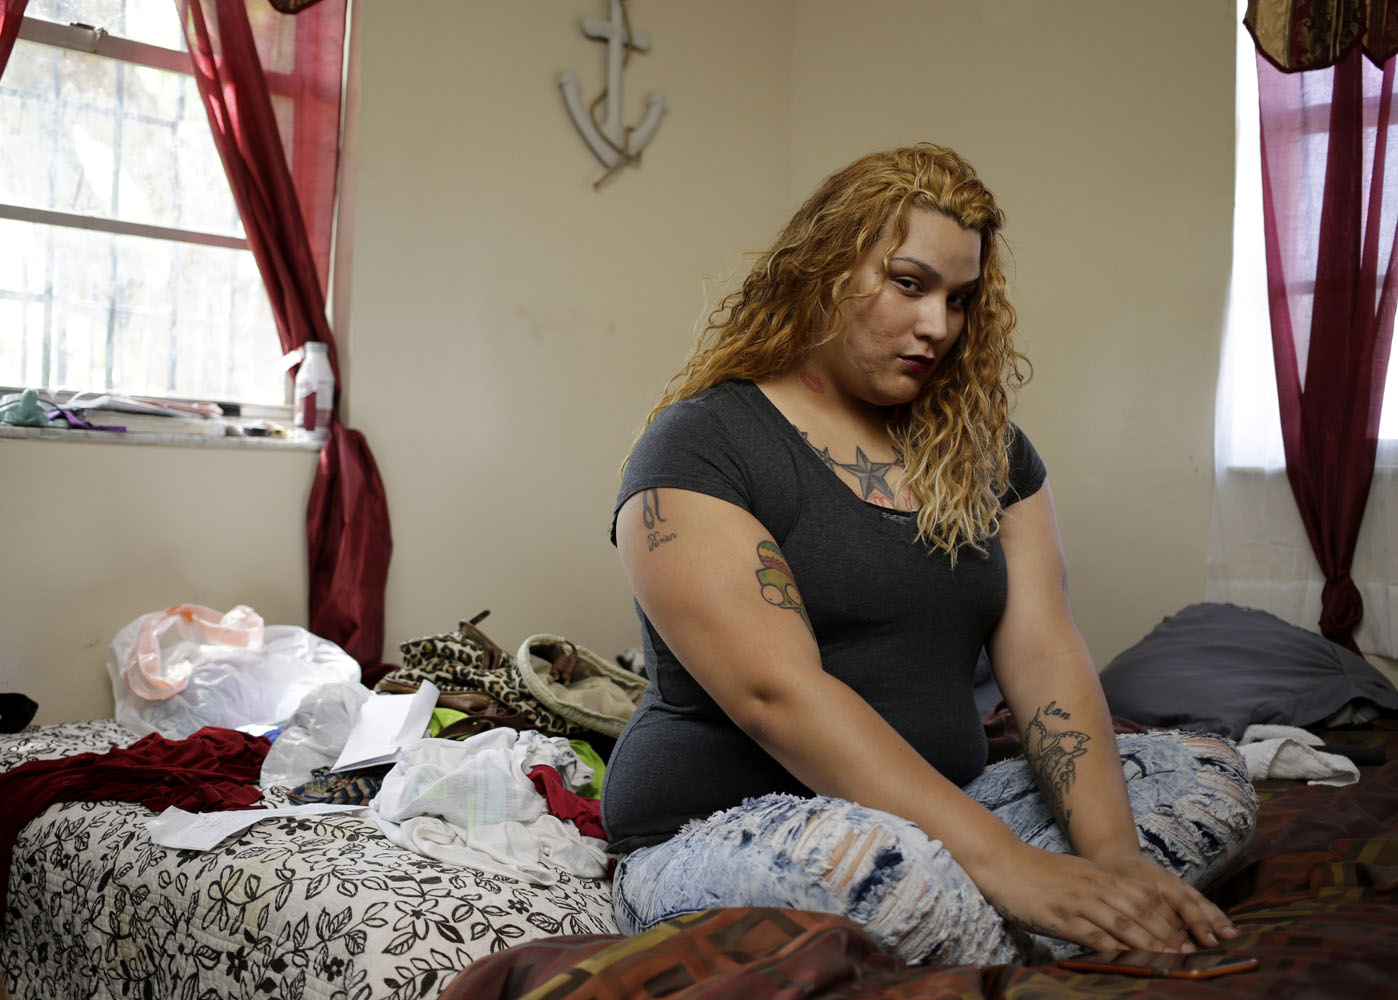 transgender and family support in mississippi jpg 1200x900